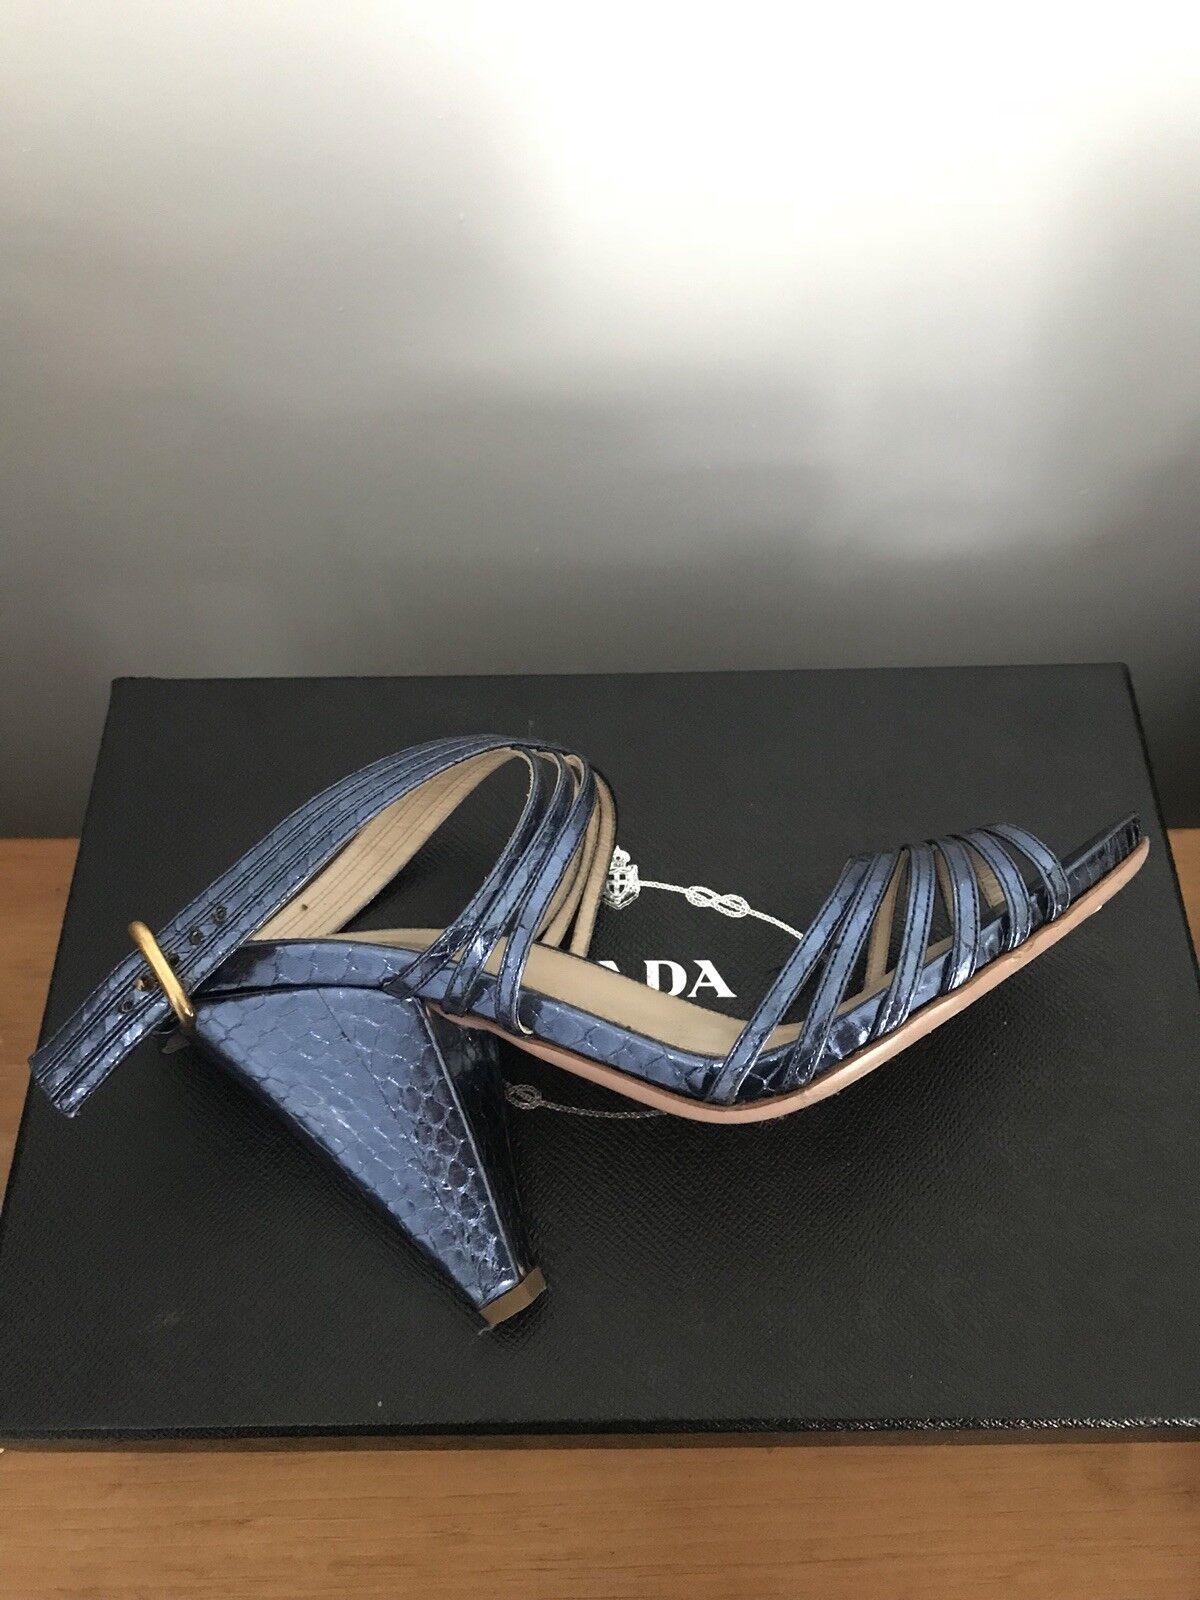 Electric Blau PRADA Schuhe snakeskin strappy wedge platforms high heels Schuhe PRADA 40.5 10.5 f9c13b